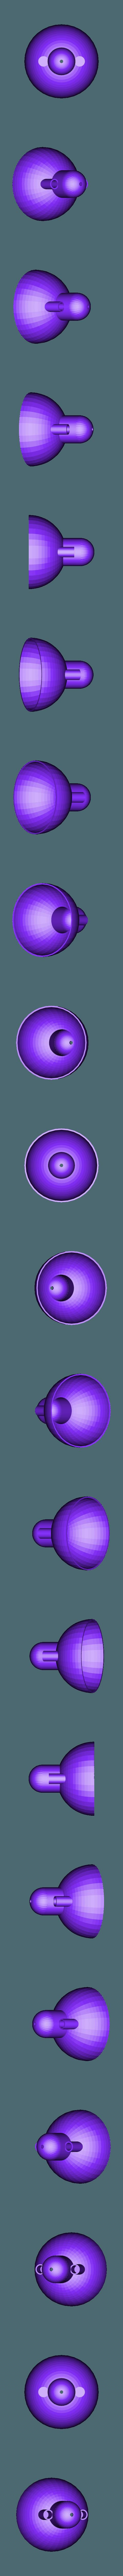 Luminaria_bojo.stl Download free STL file Luminária de parede • Object to 3D print, CircuitoMaker